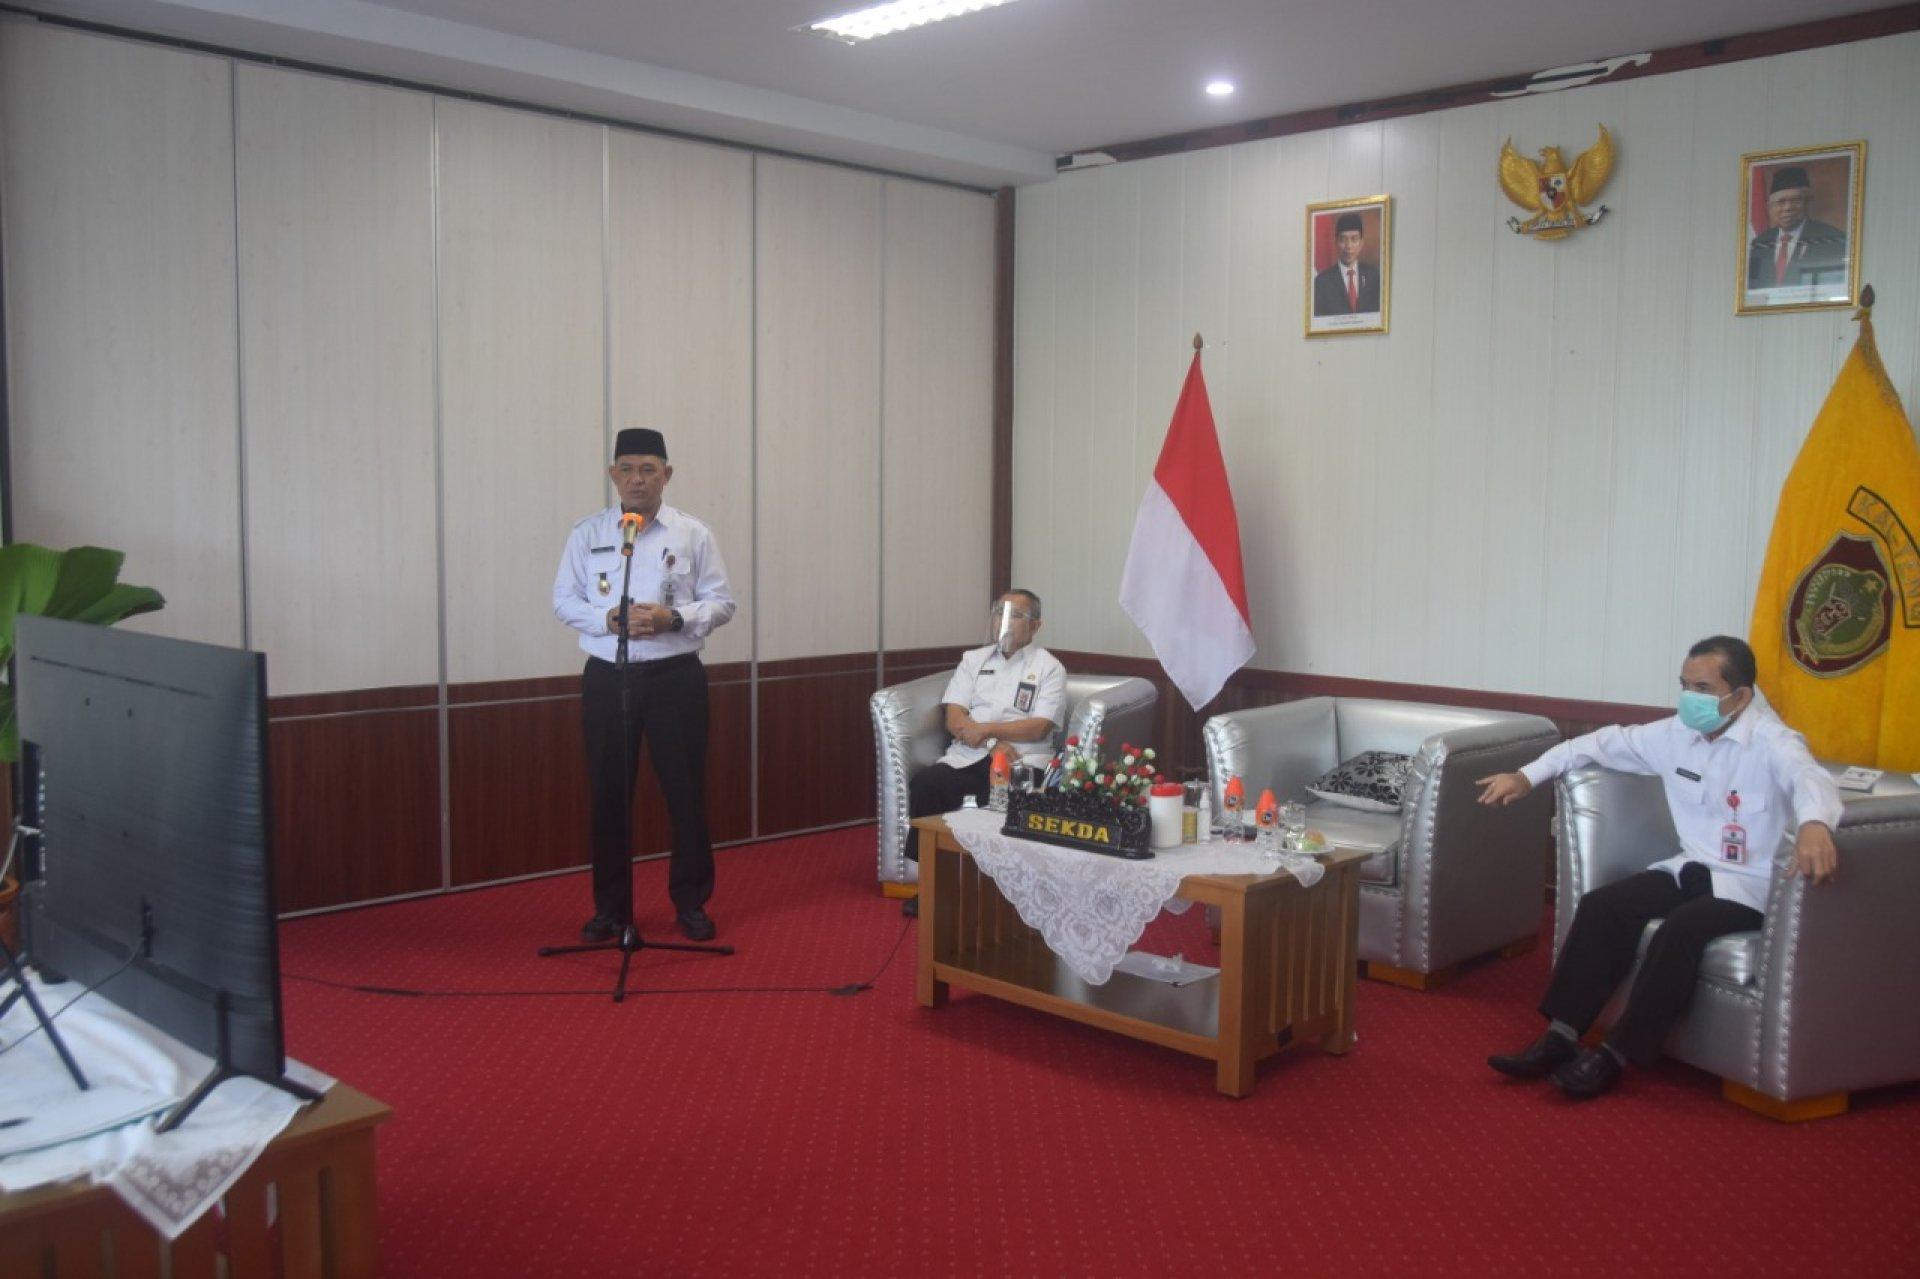 Sekda Hadiri Konsultasi Publik Rancangan Awal RKPD Kalteng Tahun 2022